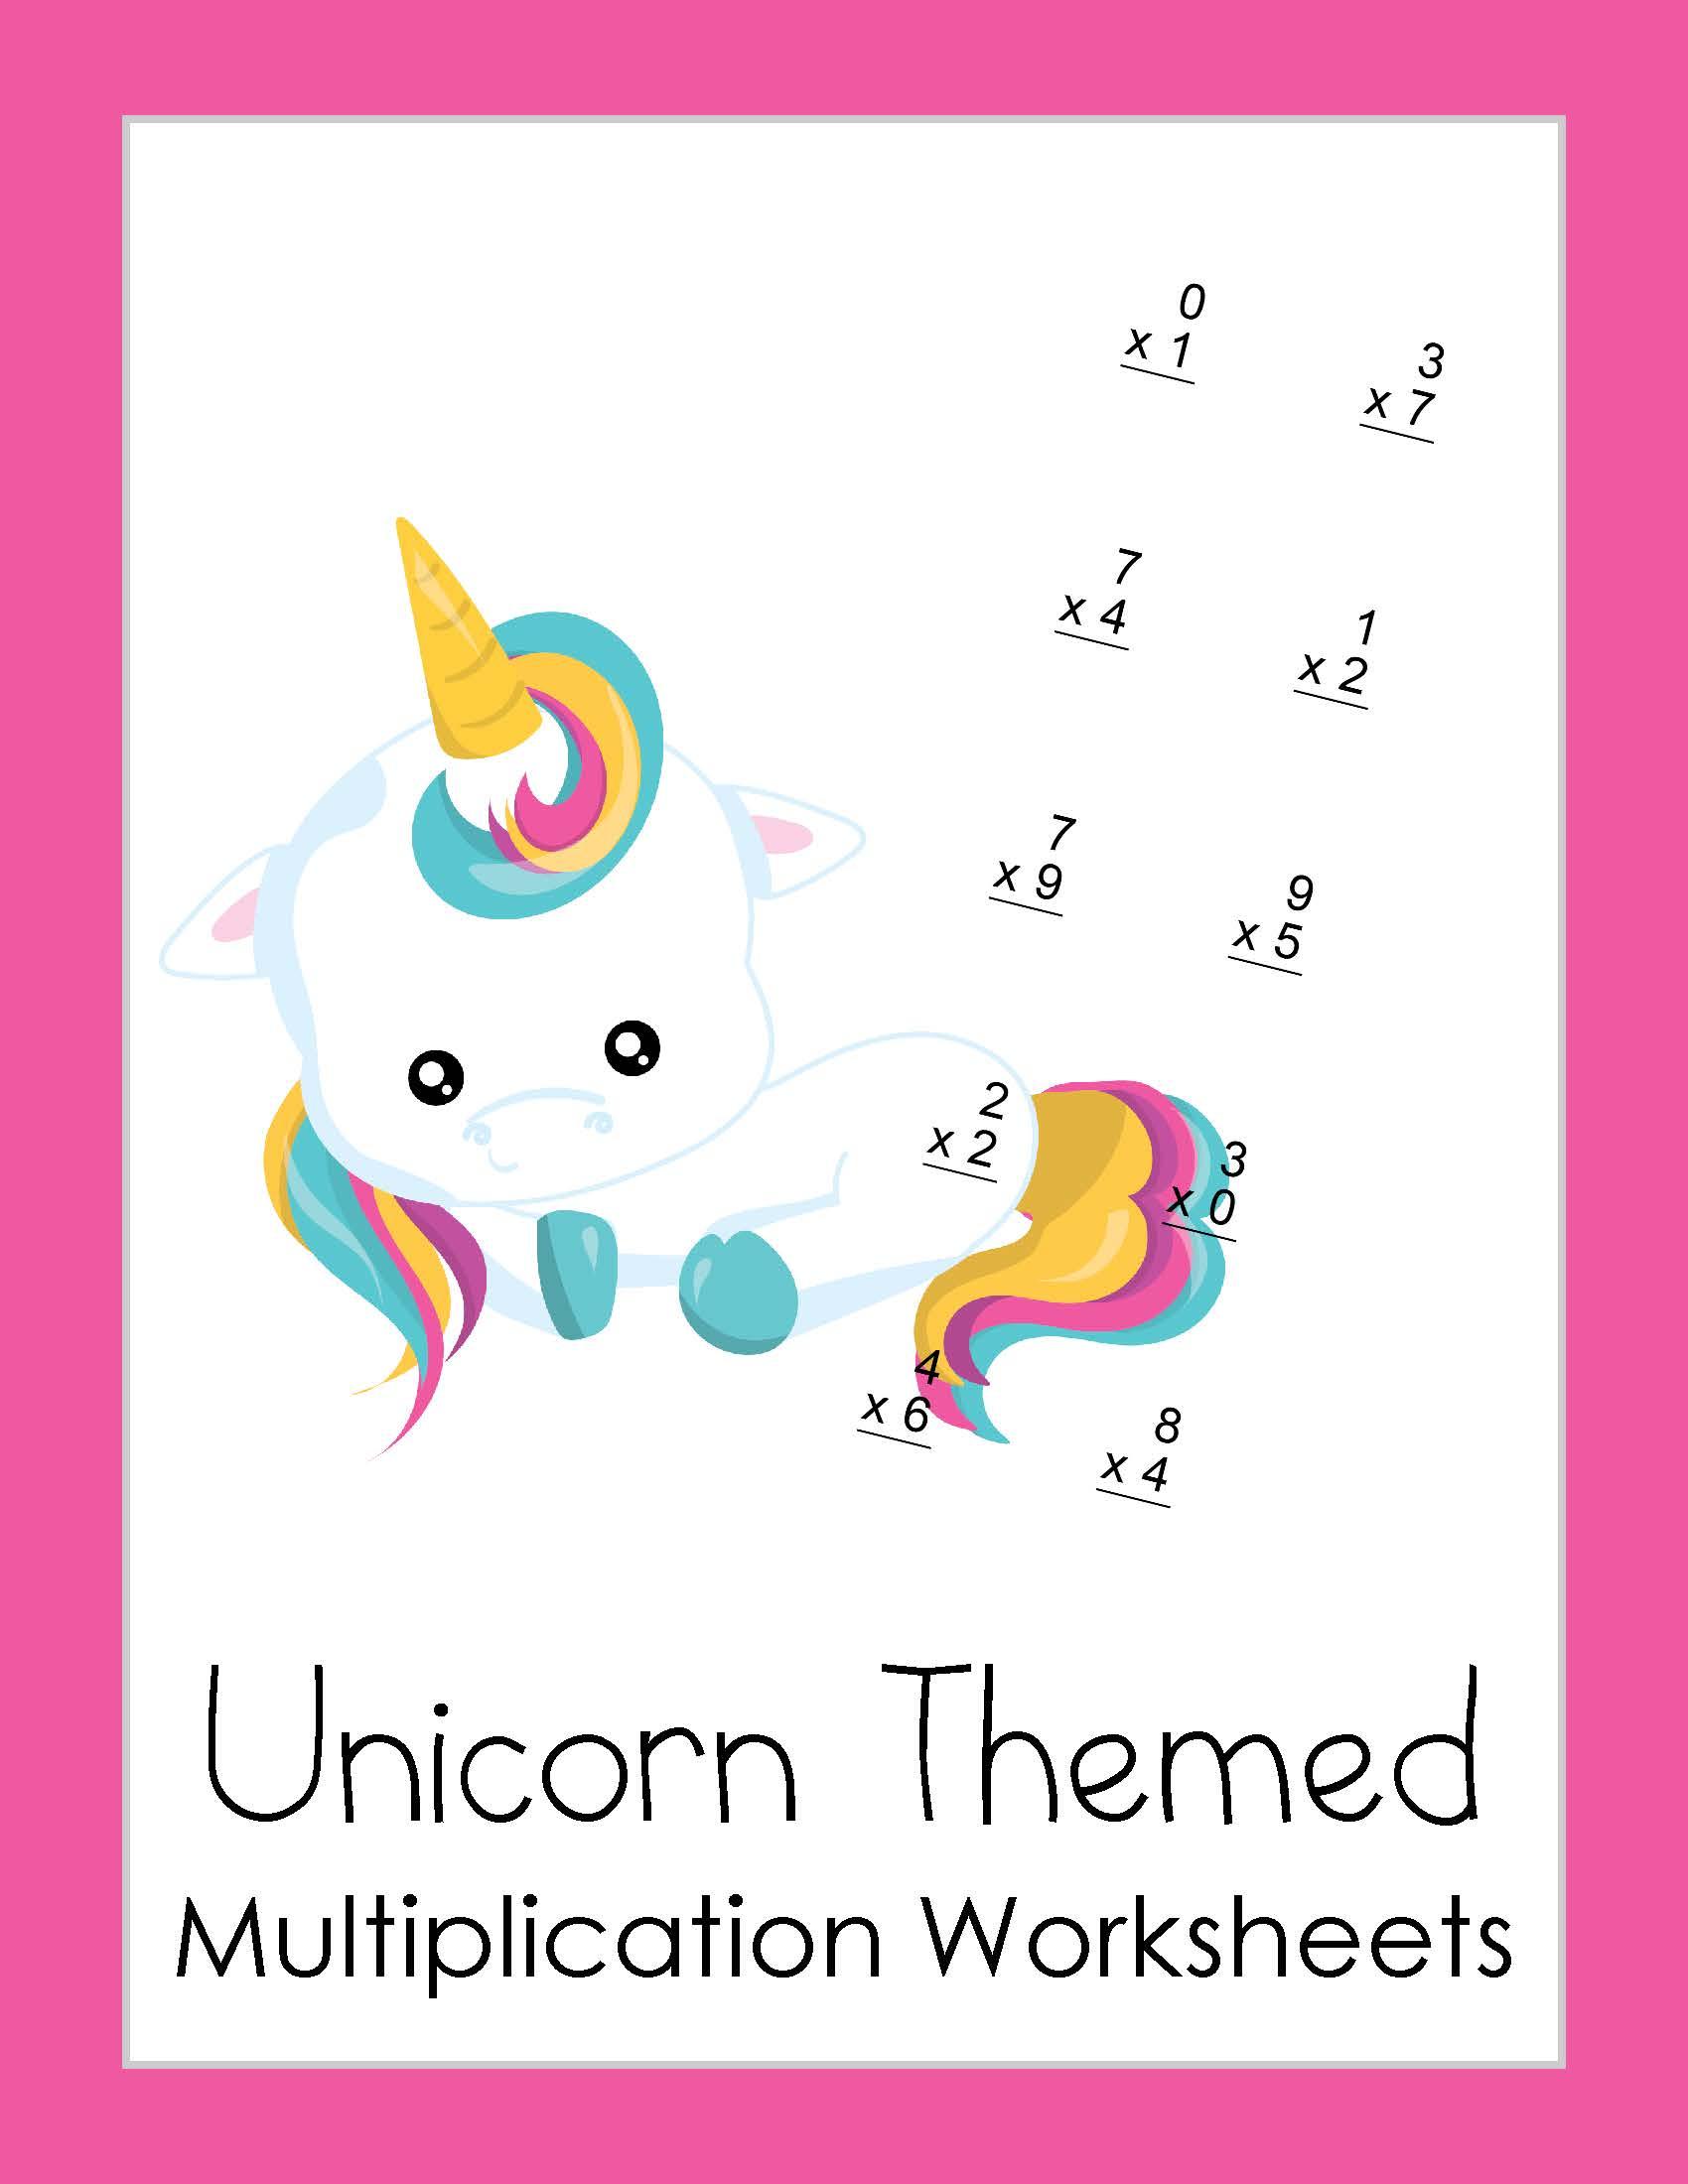 Free Multiplication Worksheets Unicorn Theme Printable